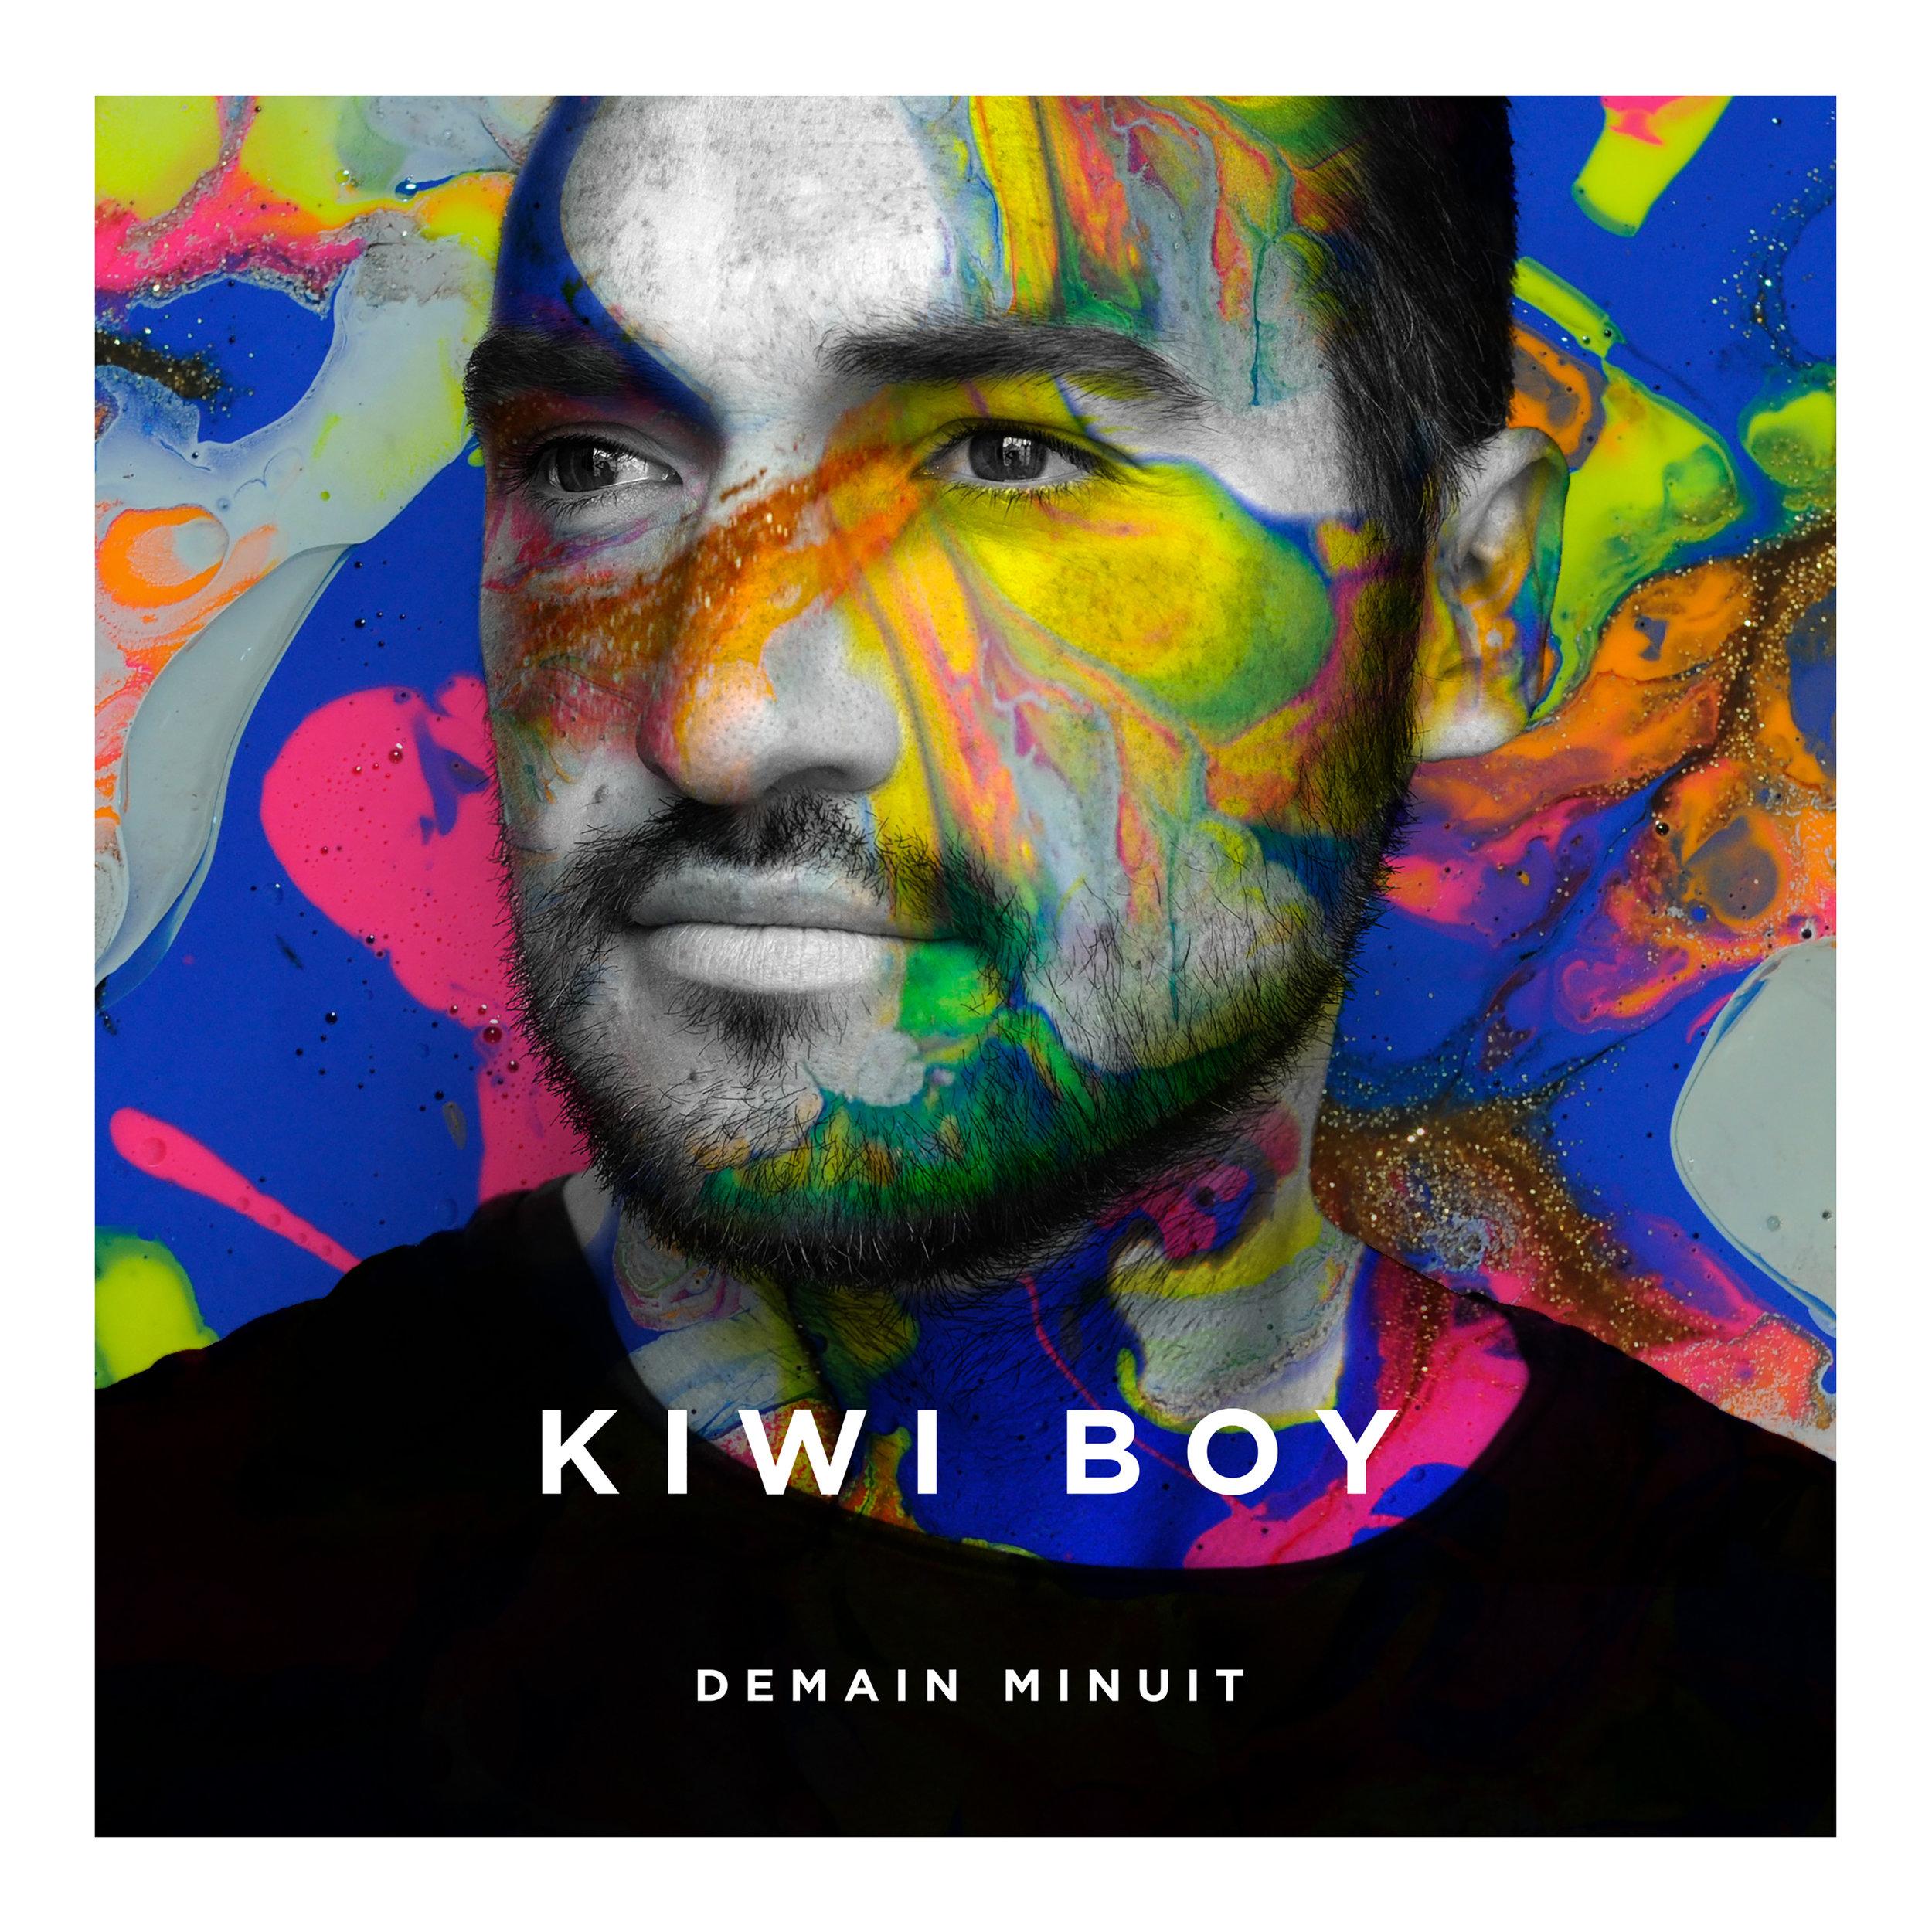 3000x3000px_kiwi boy FINAL noir et blanc (2).jpg